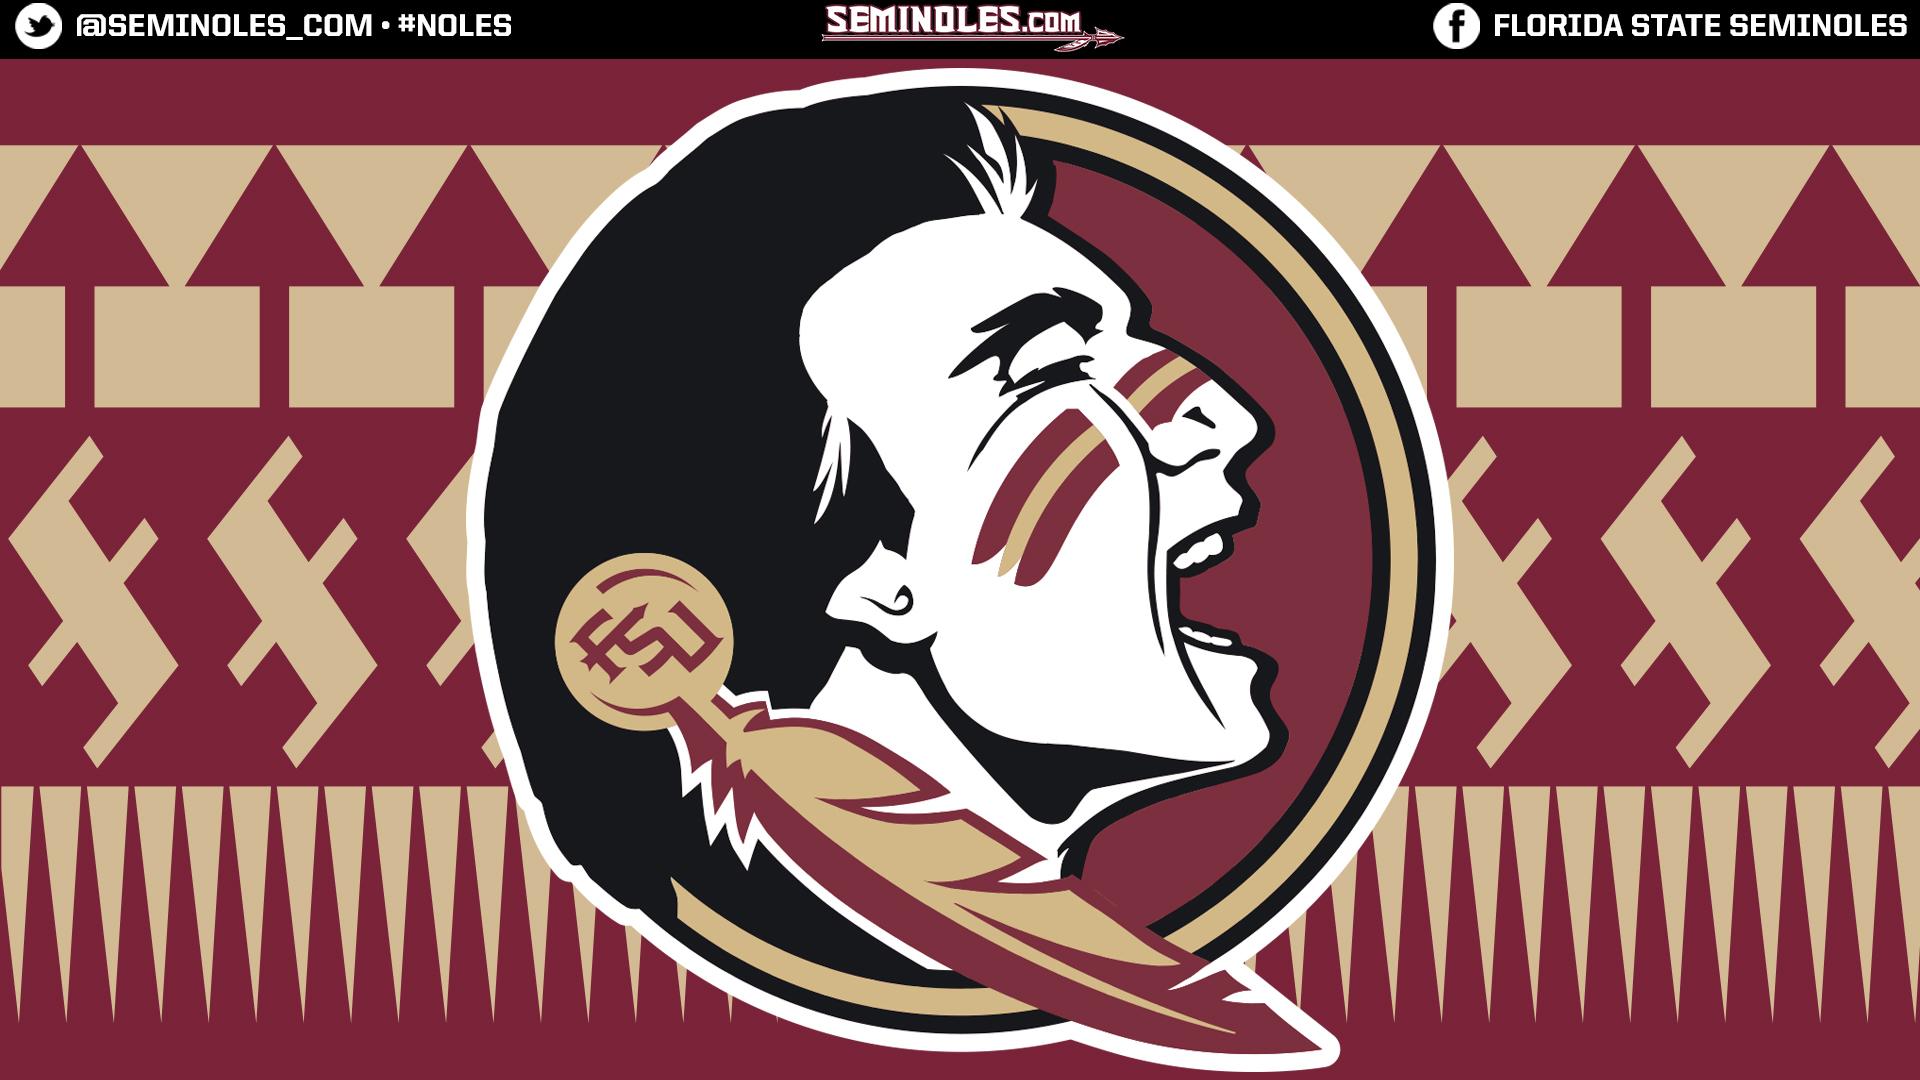 Florida State Seminoles Official Athletic Site Desktop Wallpaper 1920x1080